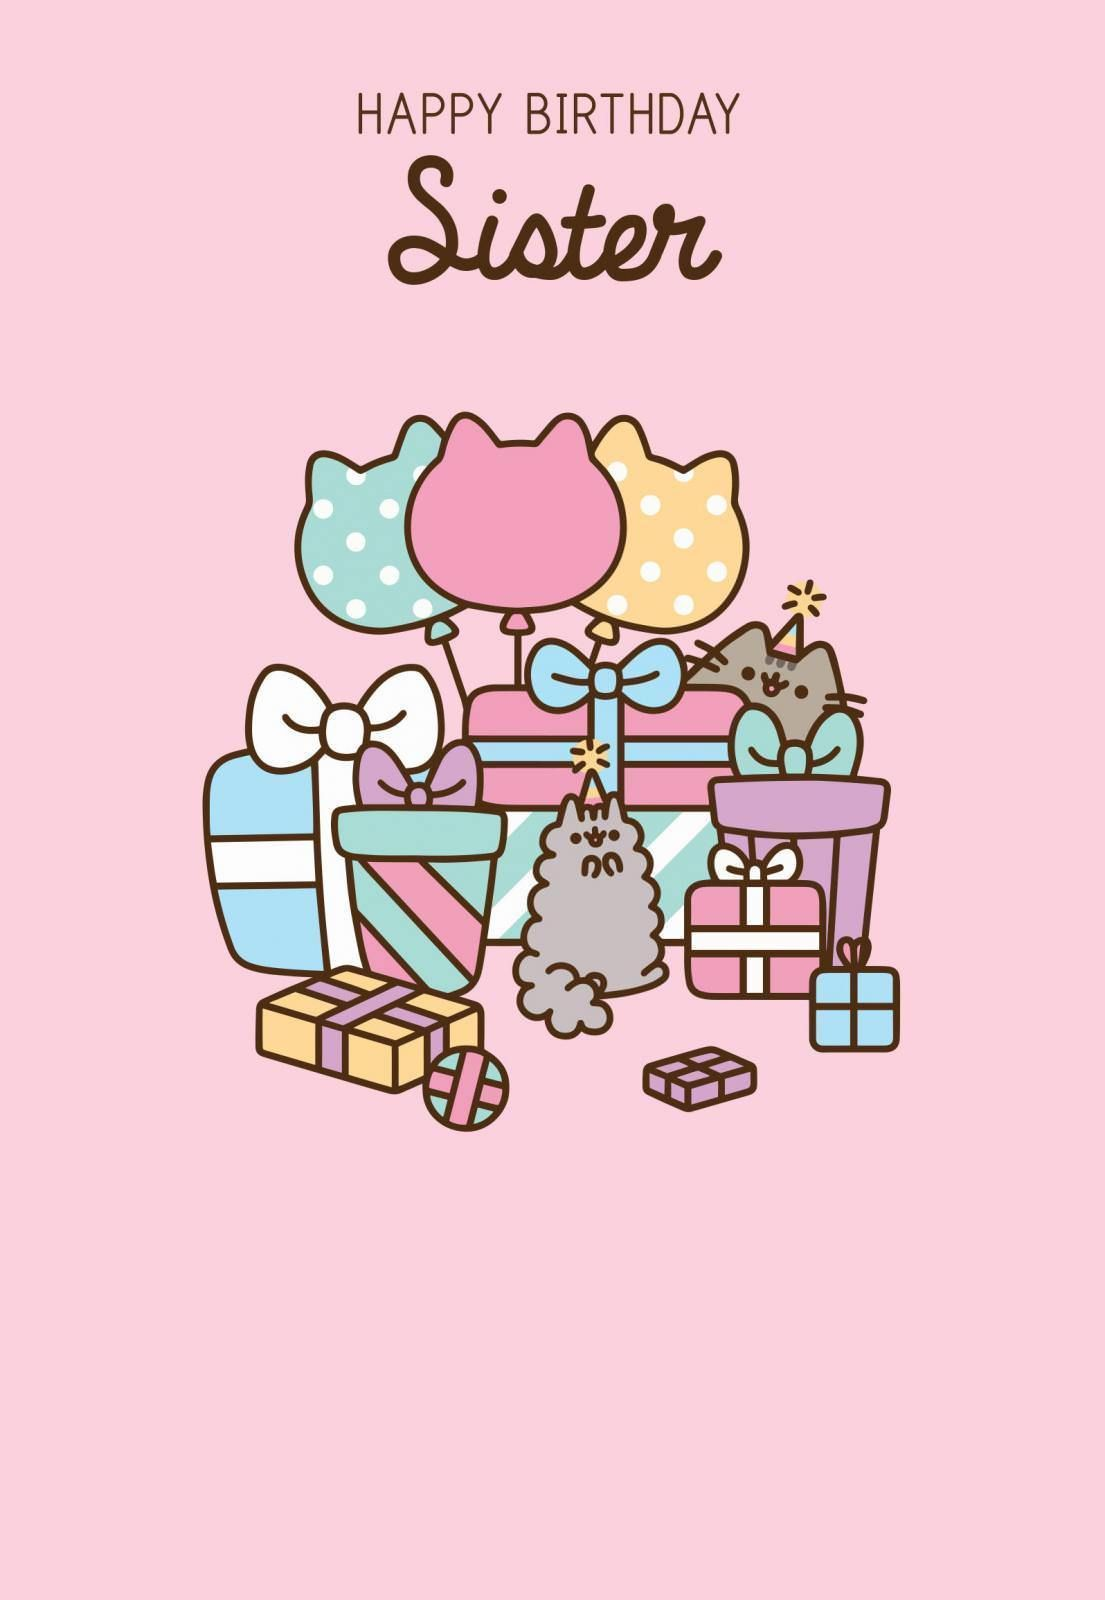 163 2 49 Gbp Pusheen Happy Birthday Sister Card Gift Ebay